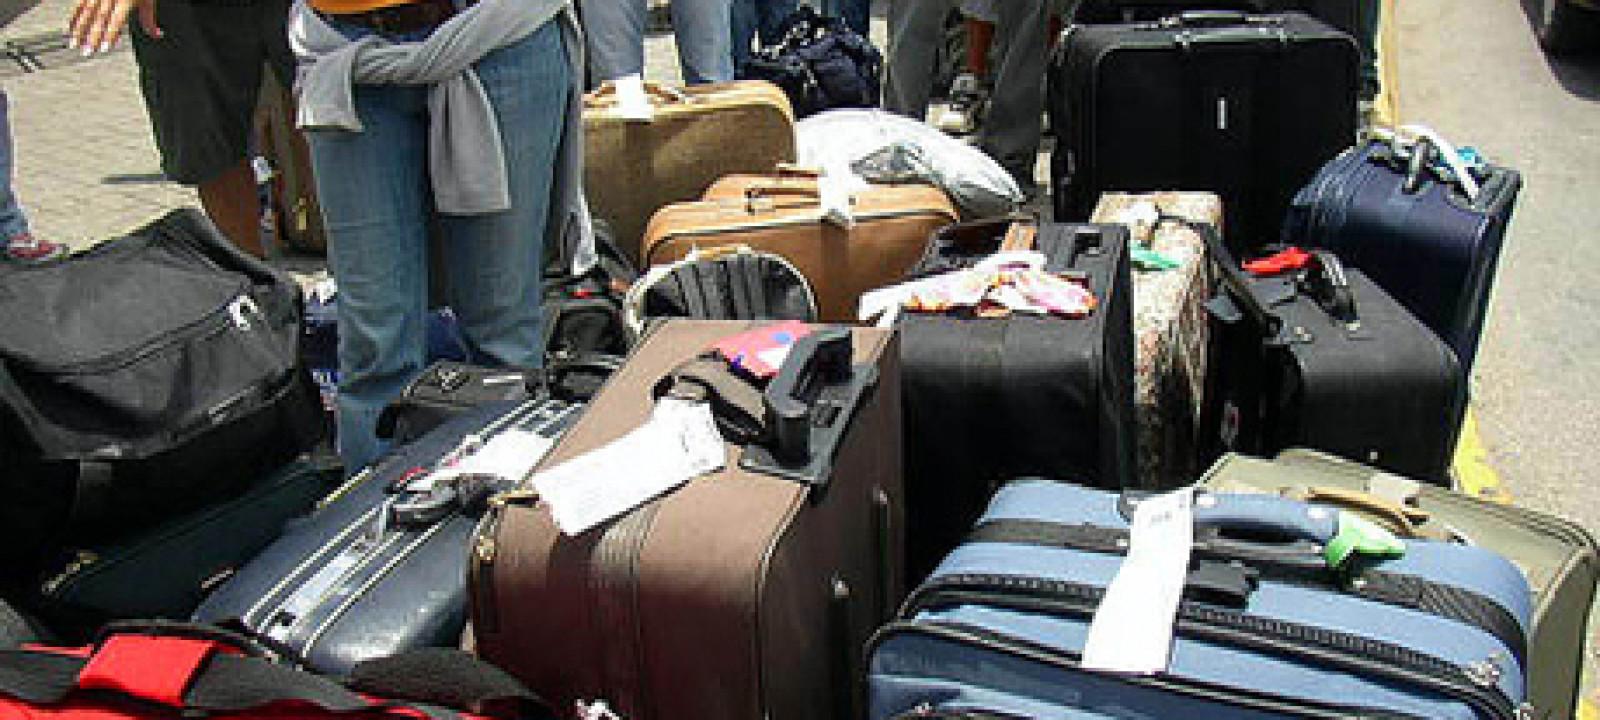 460x300_luggage